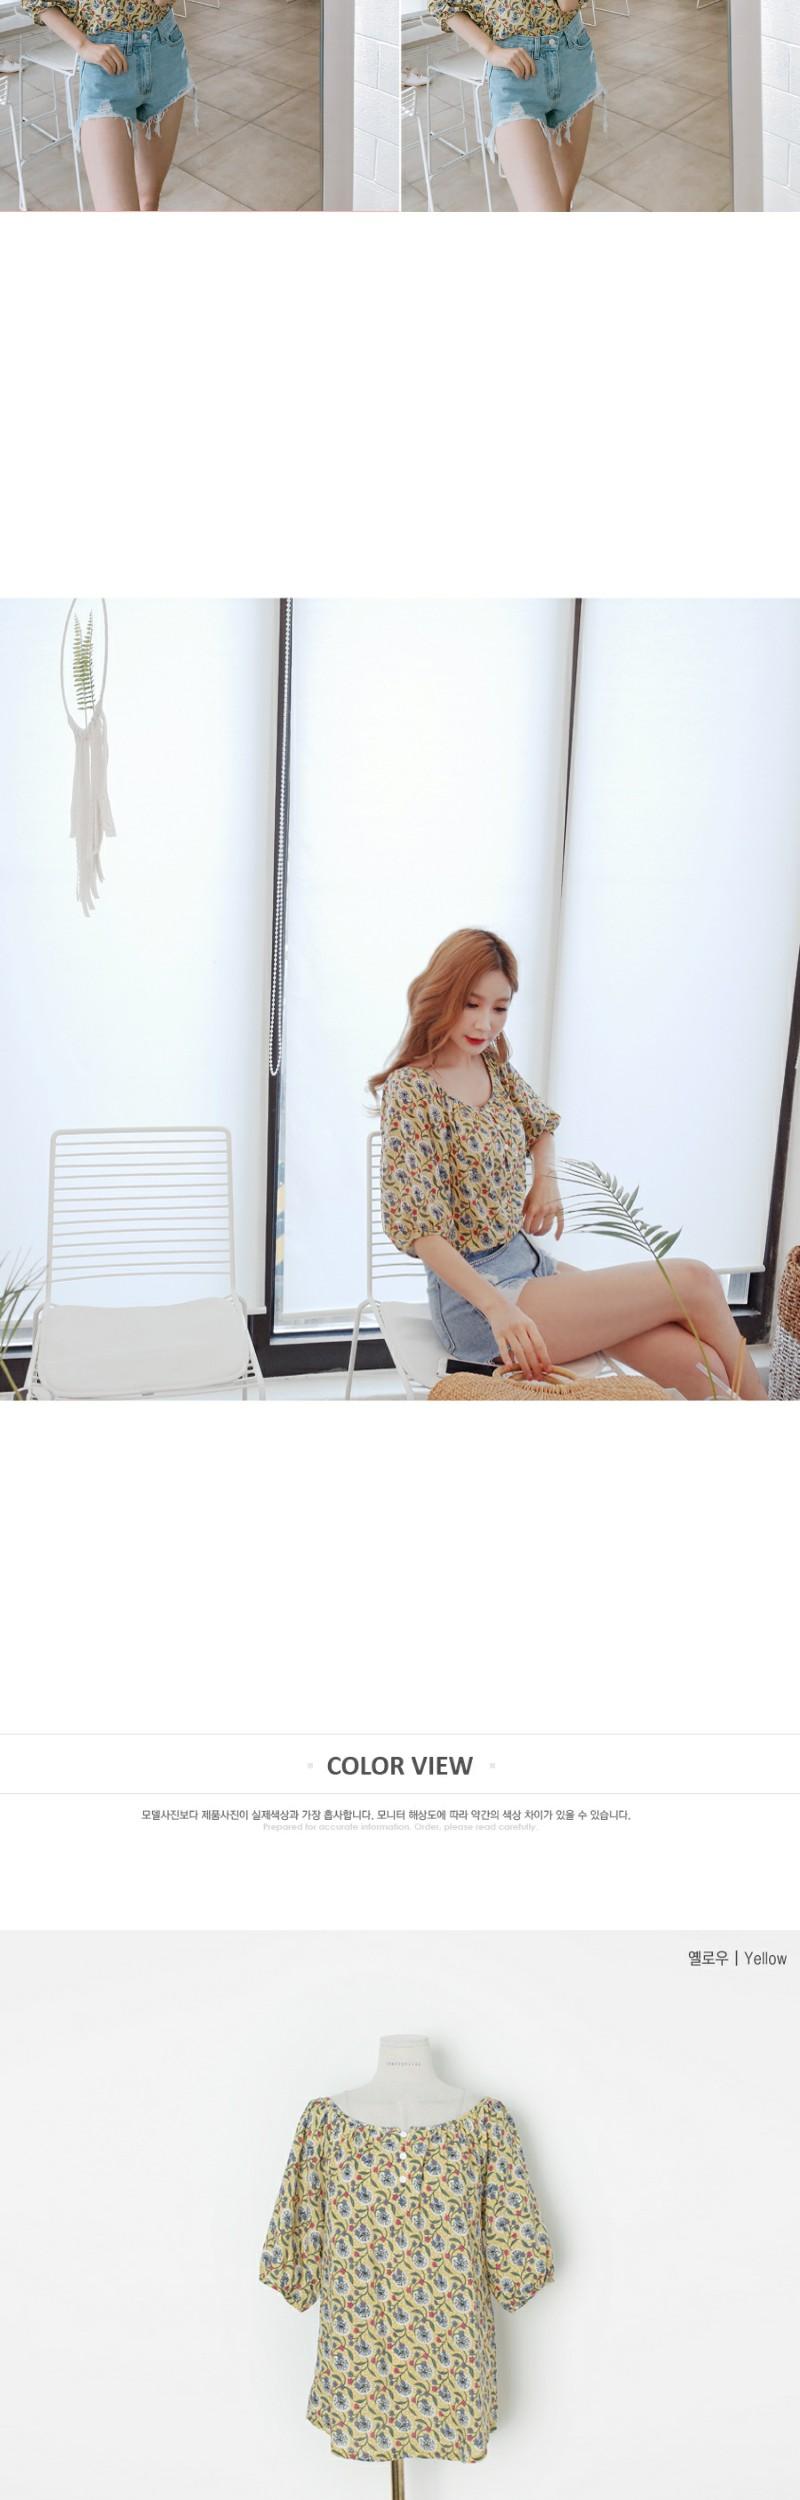 Serenity in love blouse